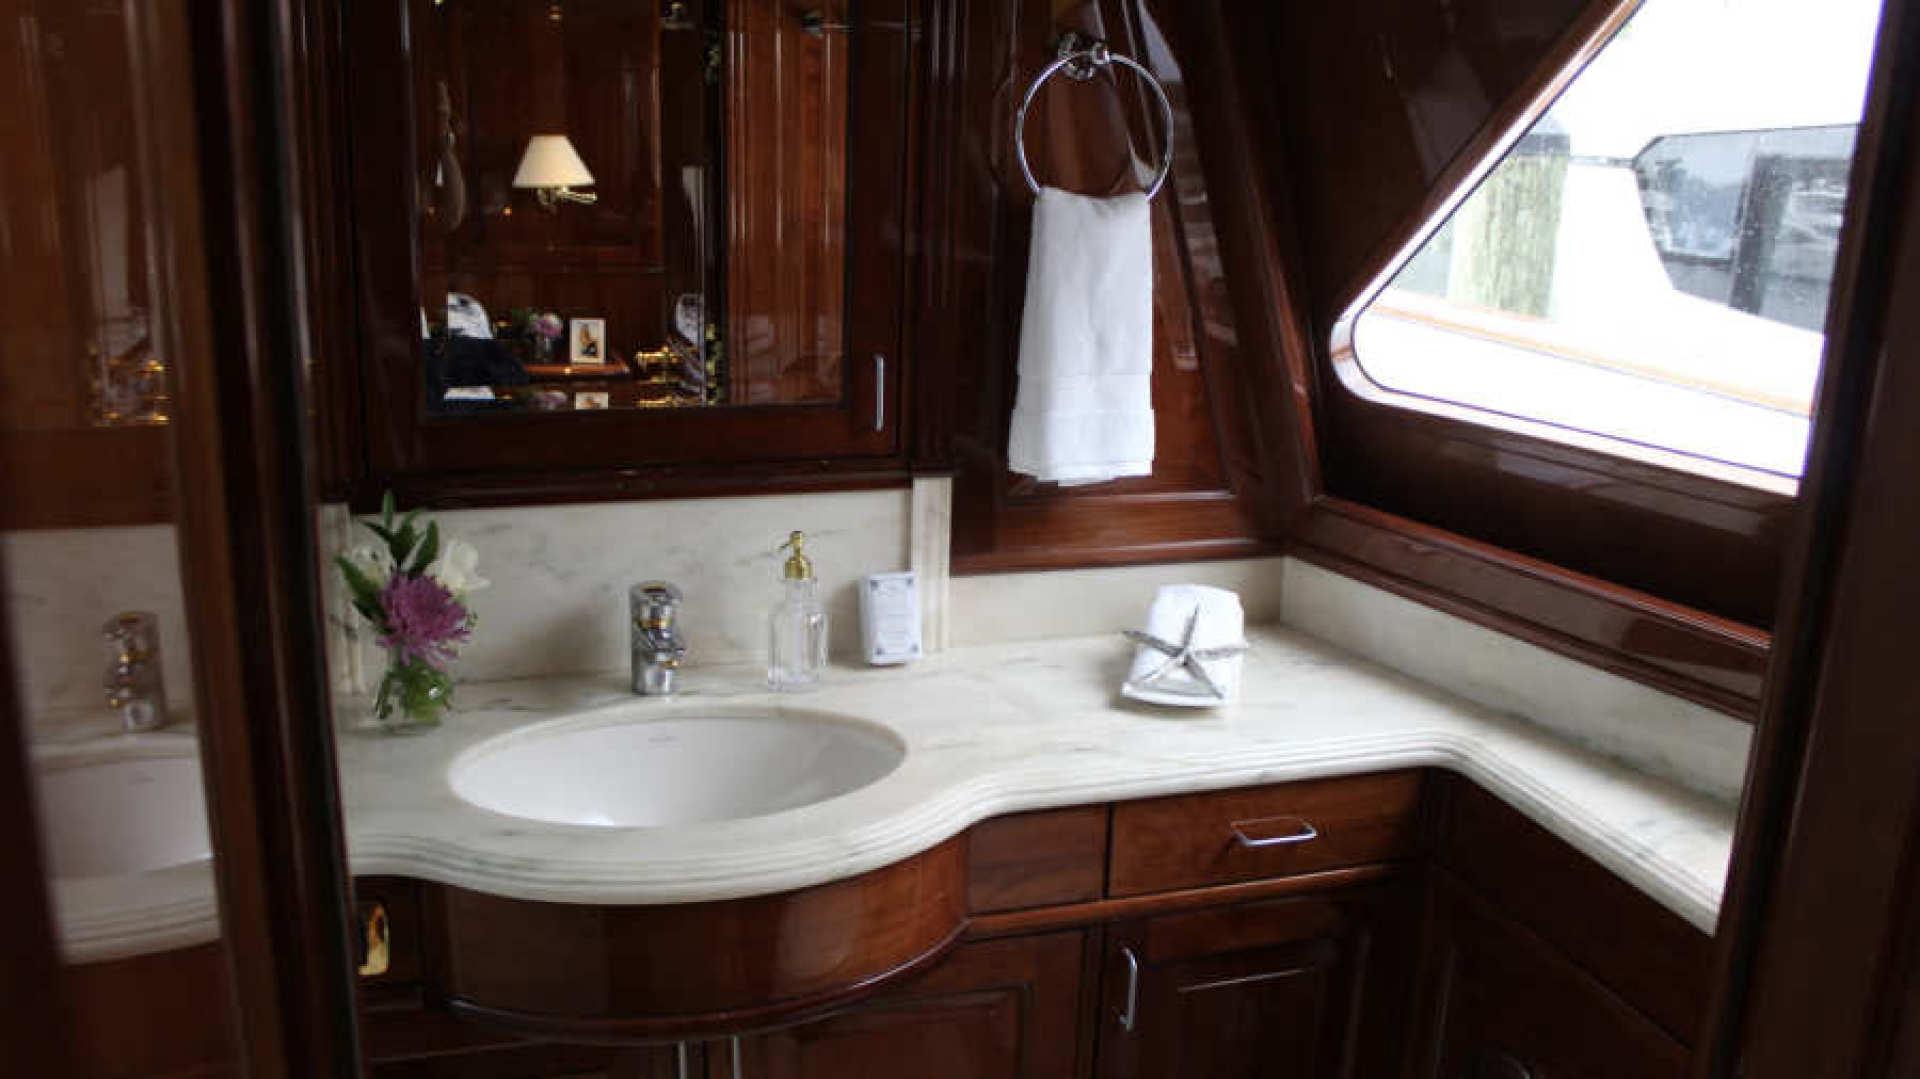 Conrad Shipyard-88 Motor Yacht 2005-Chillin Fort Lauderdale-Florida-United States-Conrad Motor Yacht 2005 Chillin-1537352 | Thumbnail